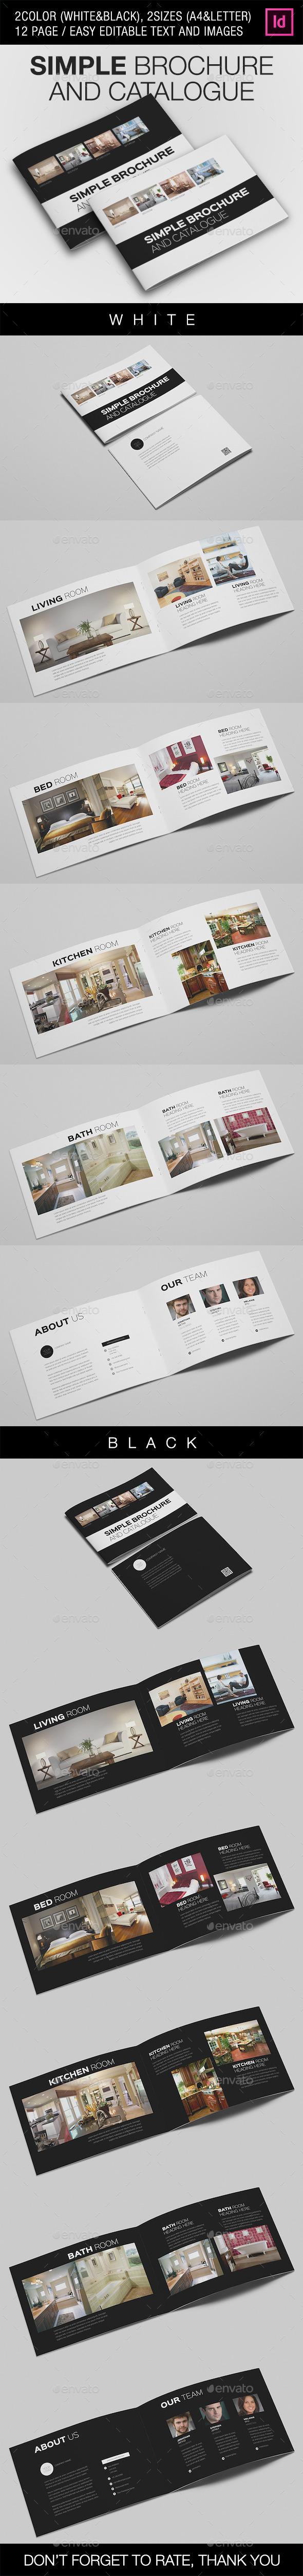 GraphicRiver Simple Catalogue Brochure V.2 8954297